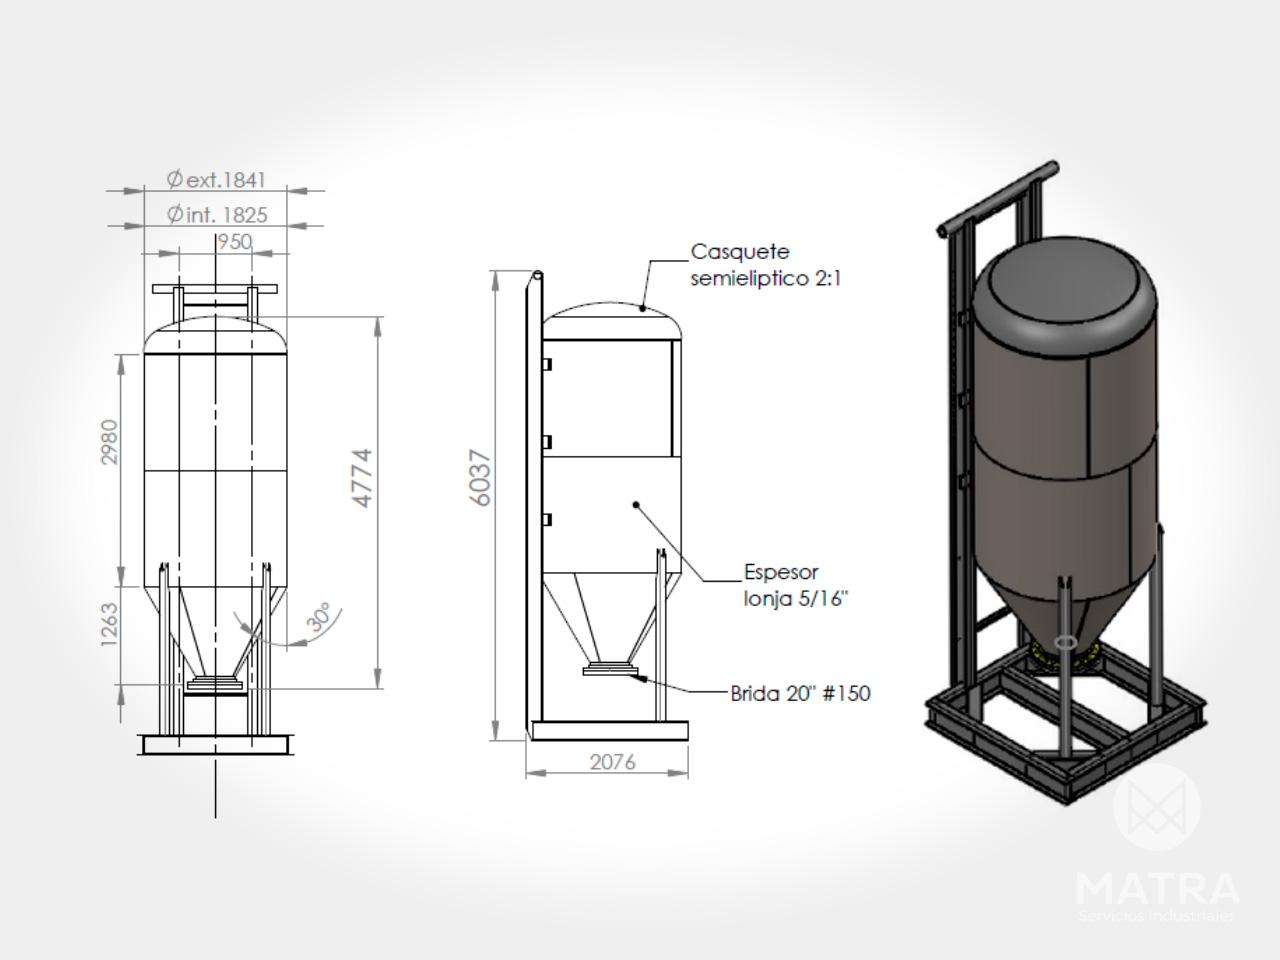 Sistema neumático para densificado